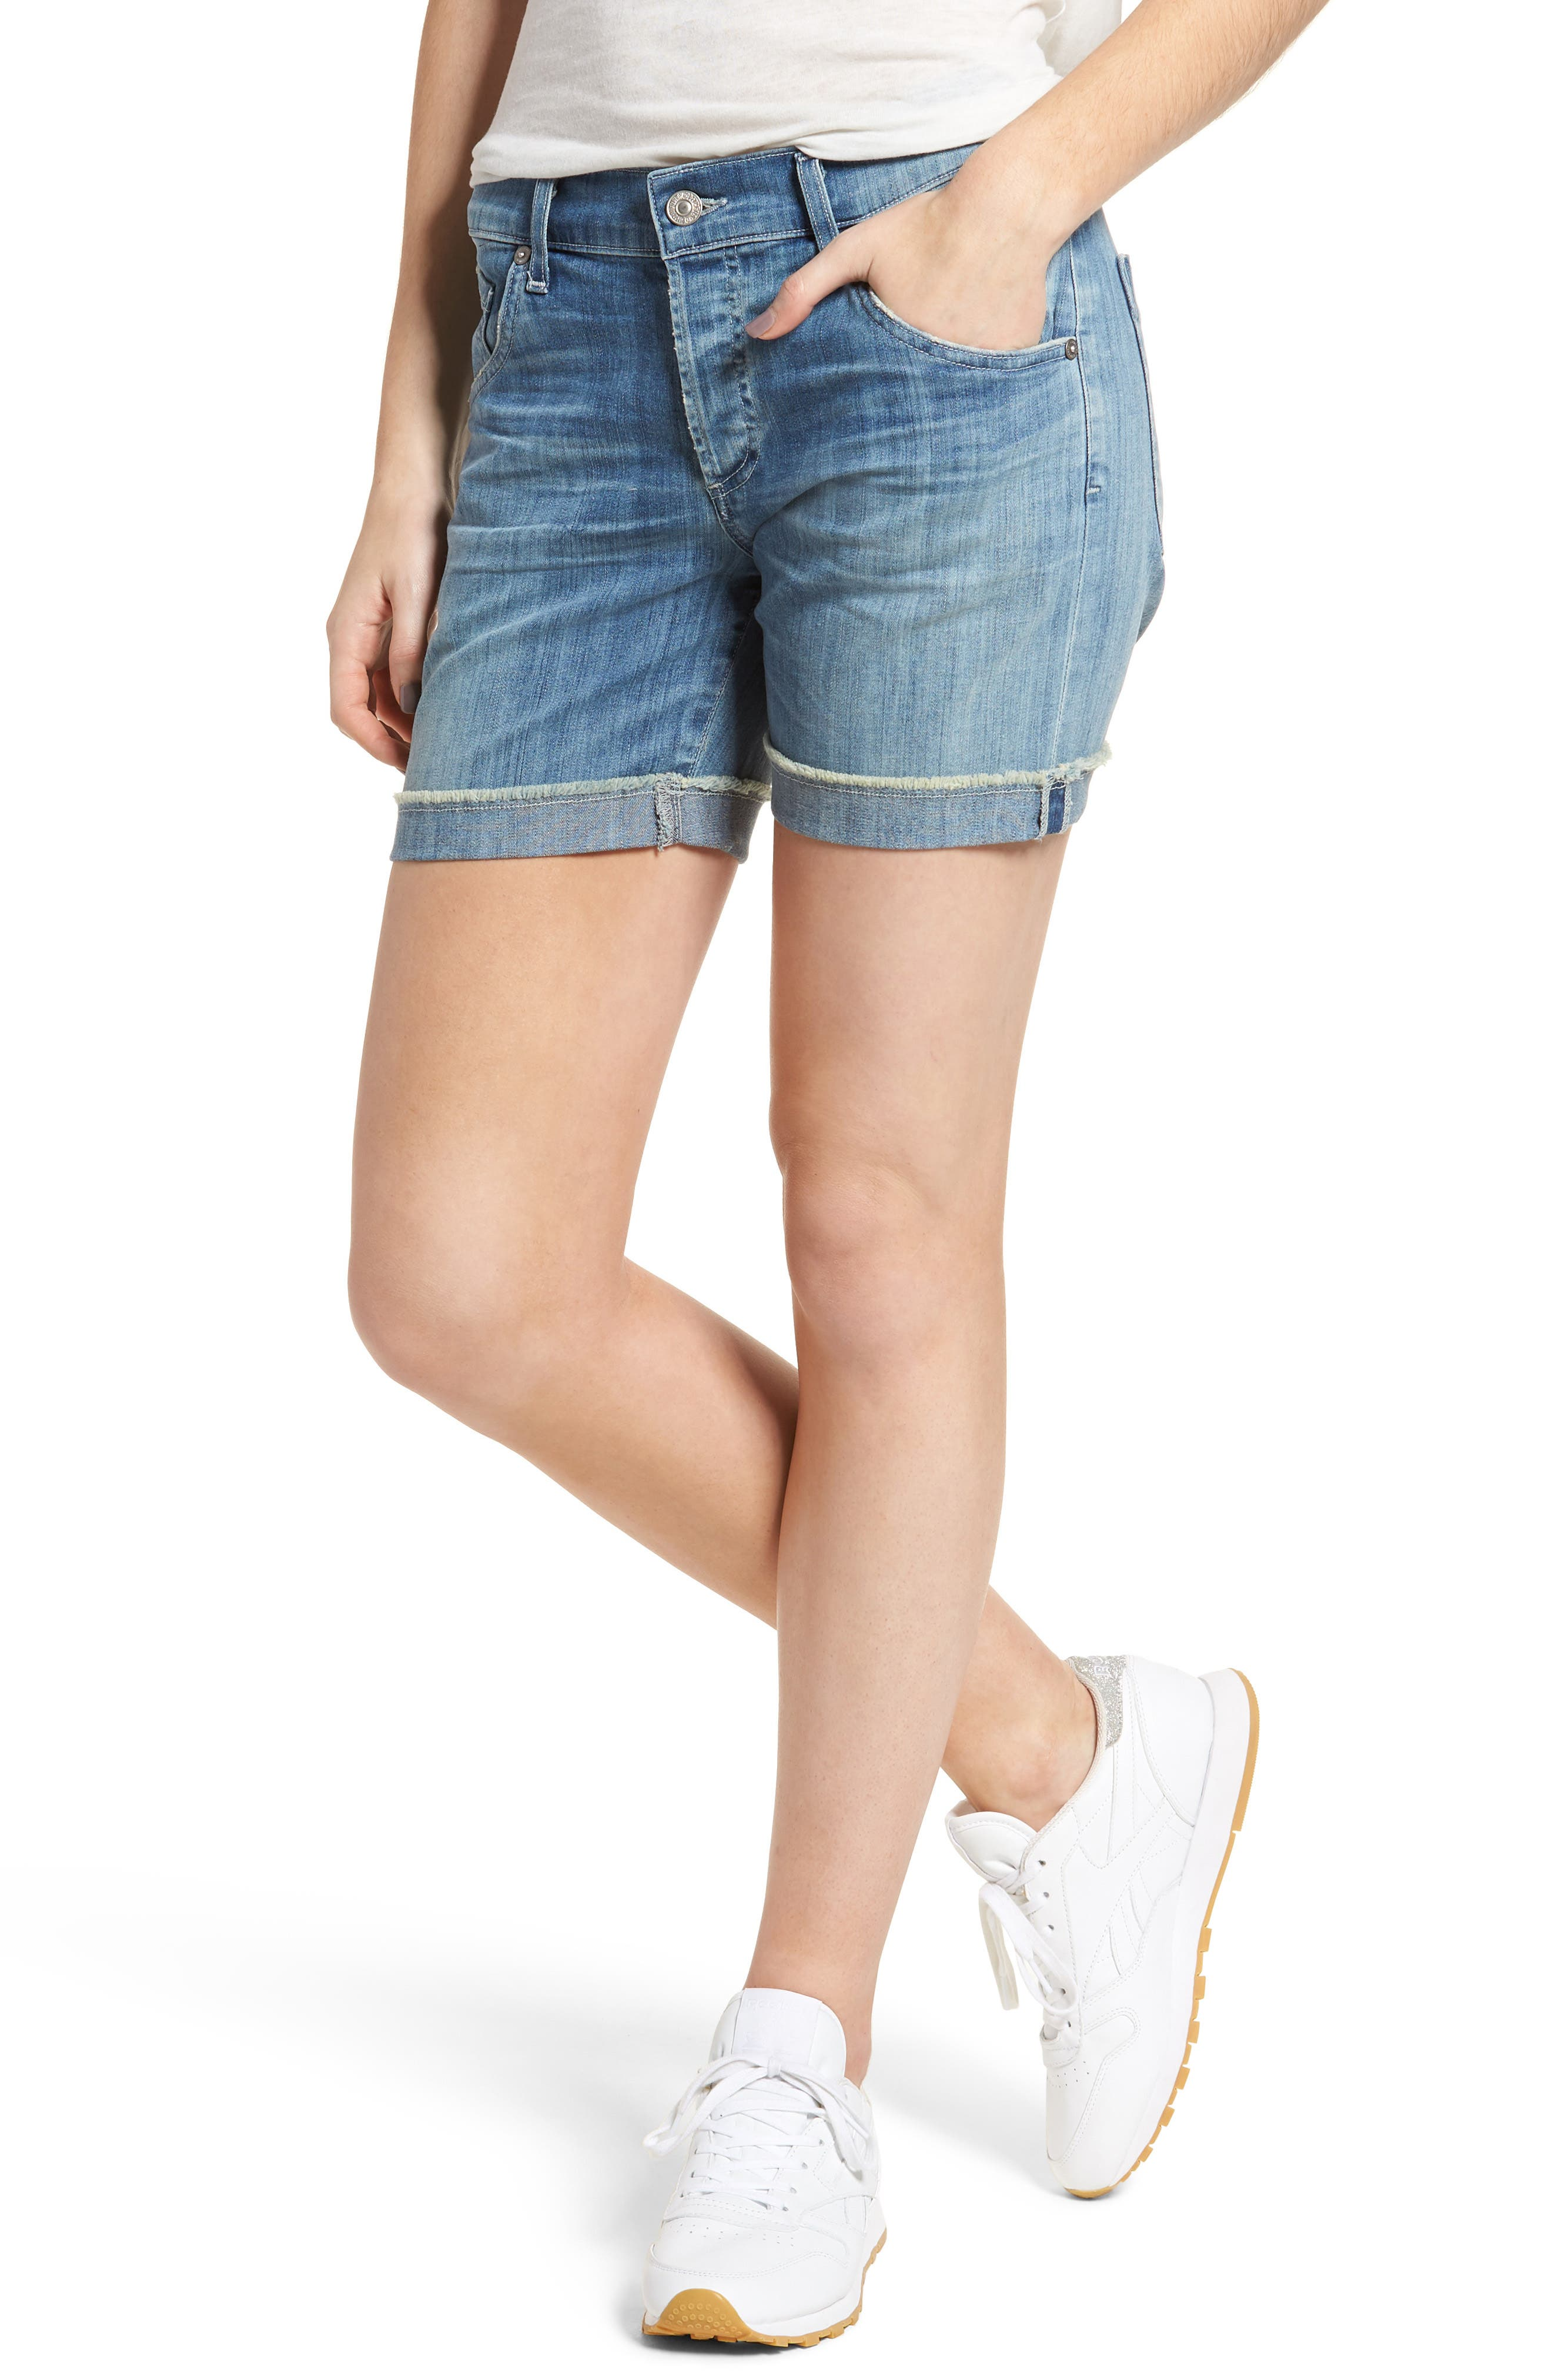 Skyler Denim Shorts,                         Main,                         color, Mercury